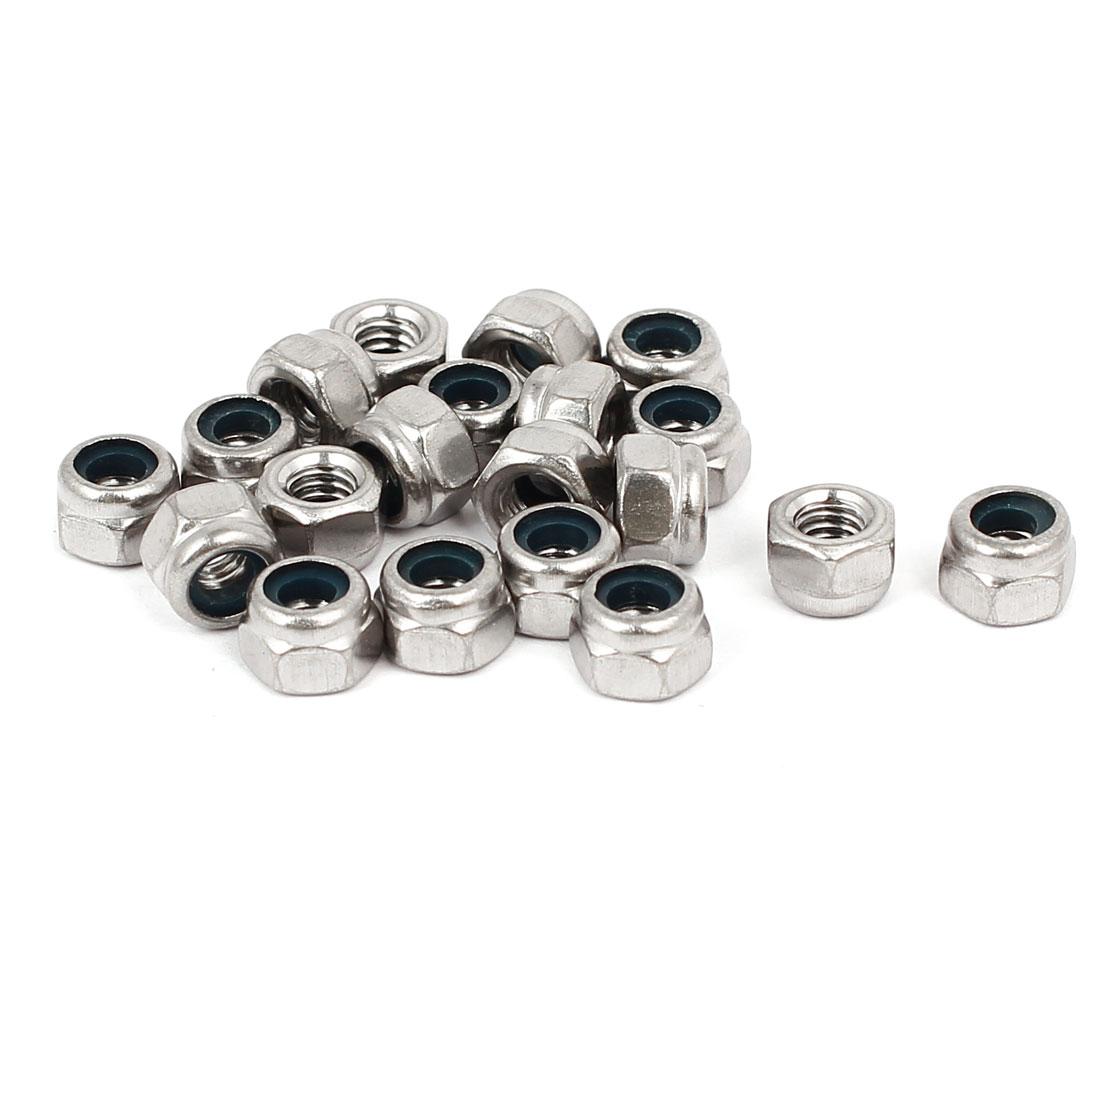 M4 316 Stainless Steel Nylock Nylon Insert Hexagonal Lock Nuts Silver Tone 20pcs